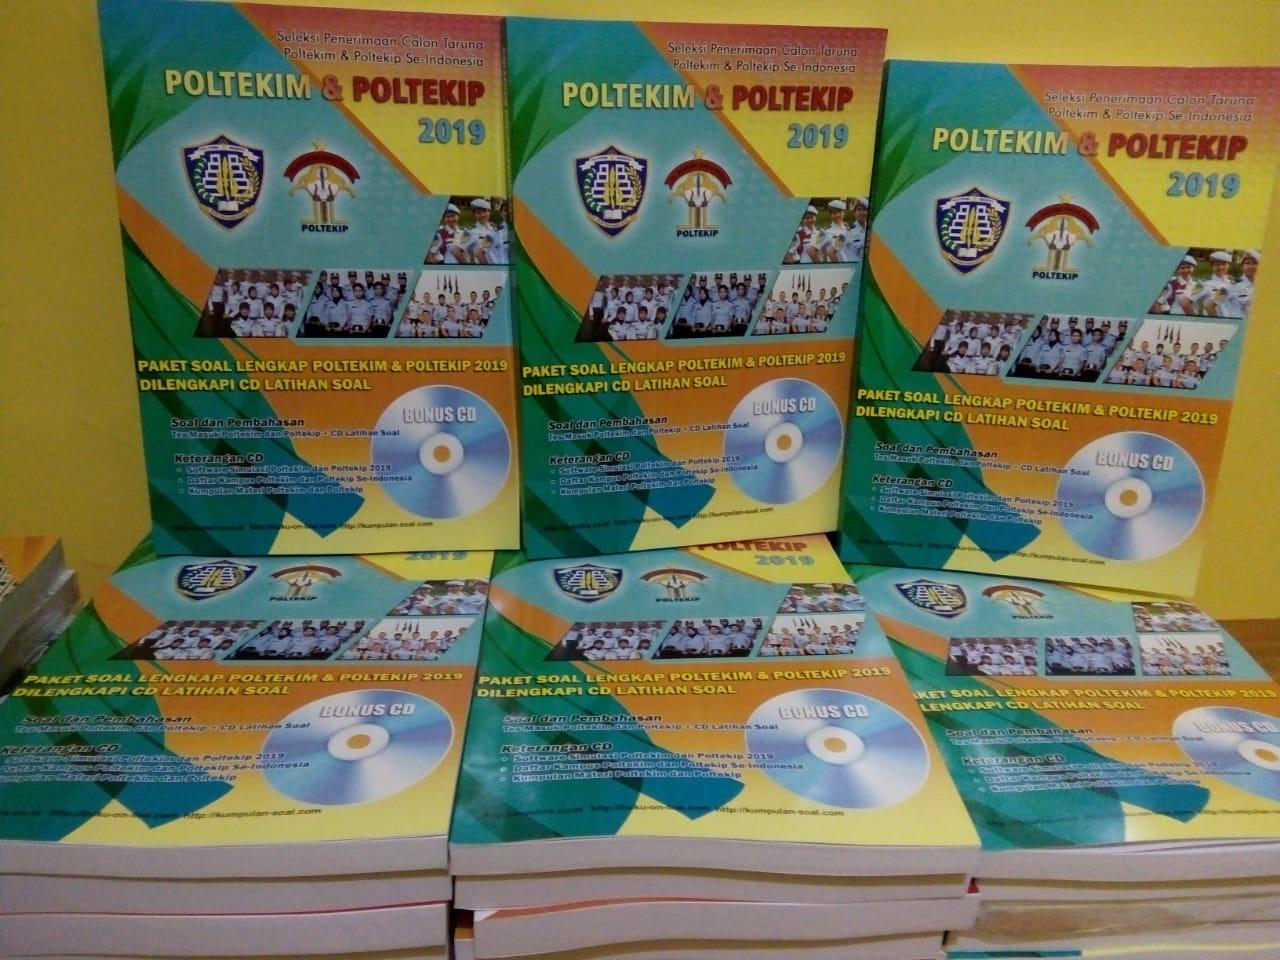 buku soal catar poltekip poltekim kemenkumham kedinasan soal dan pembahasan, Buku Poltekim & Buku Poltekip 2019